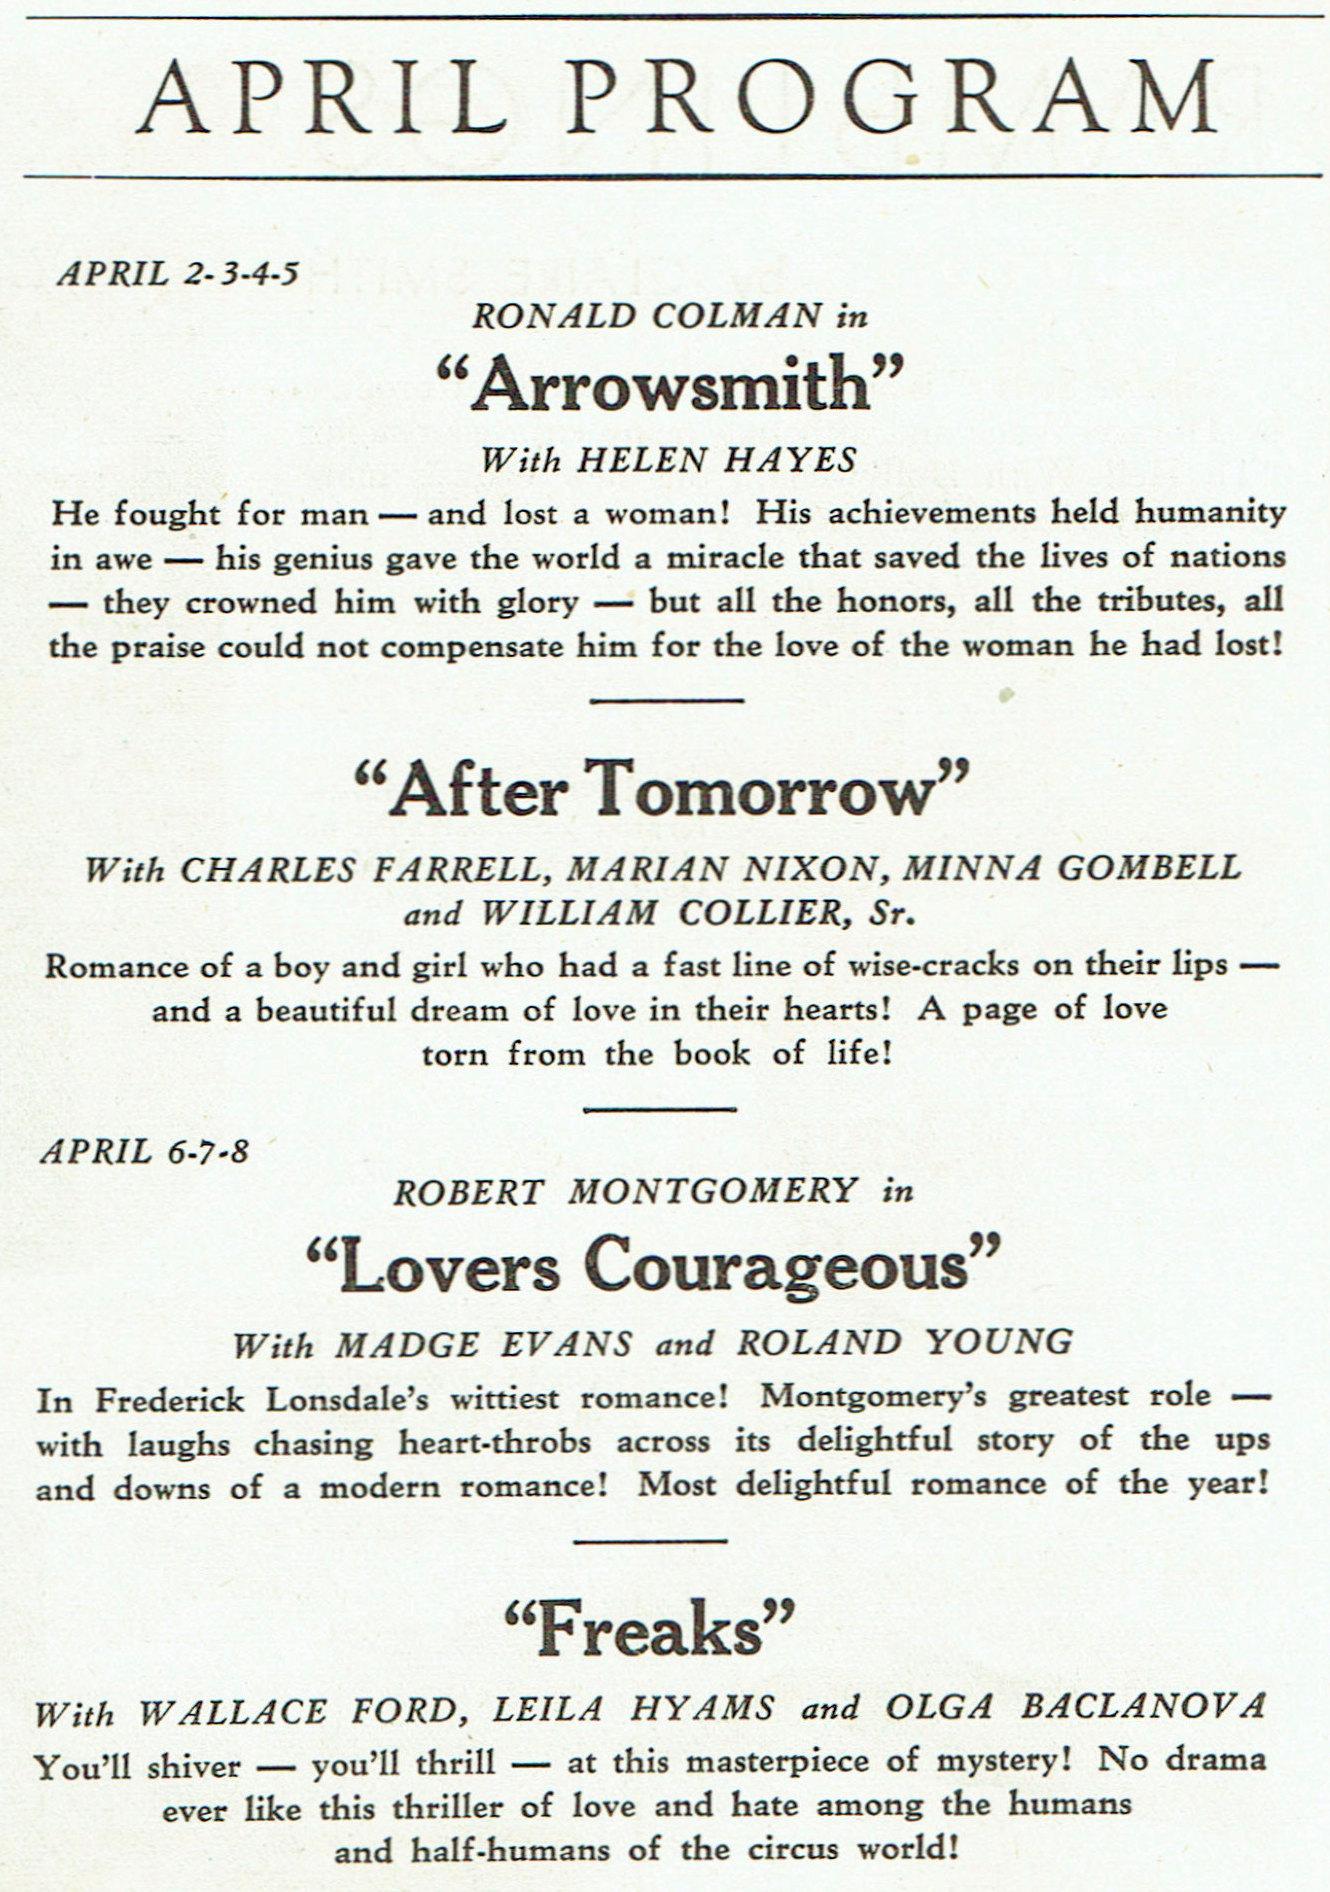 carole lombard publix theatre screen review april 1932hb